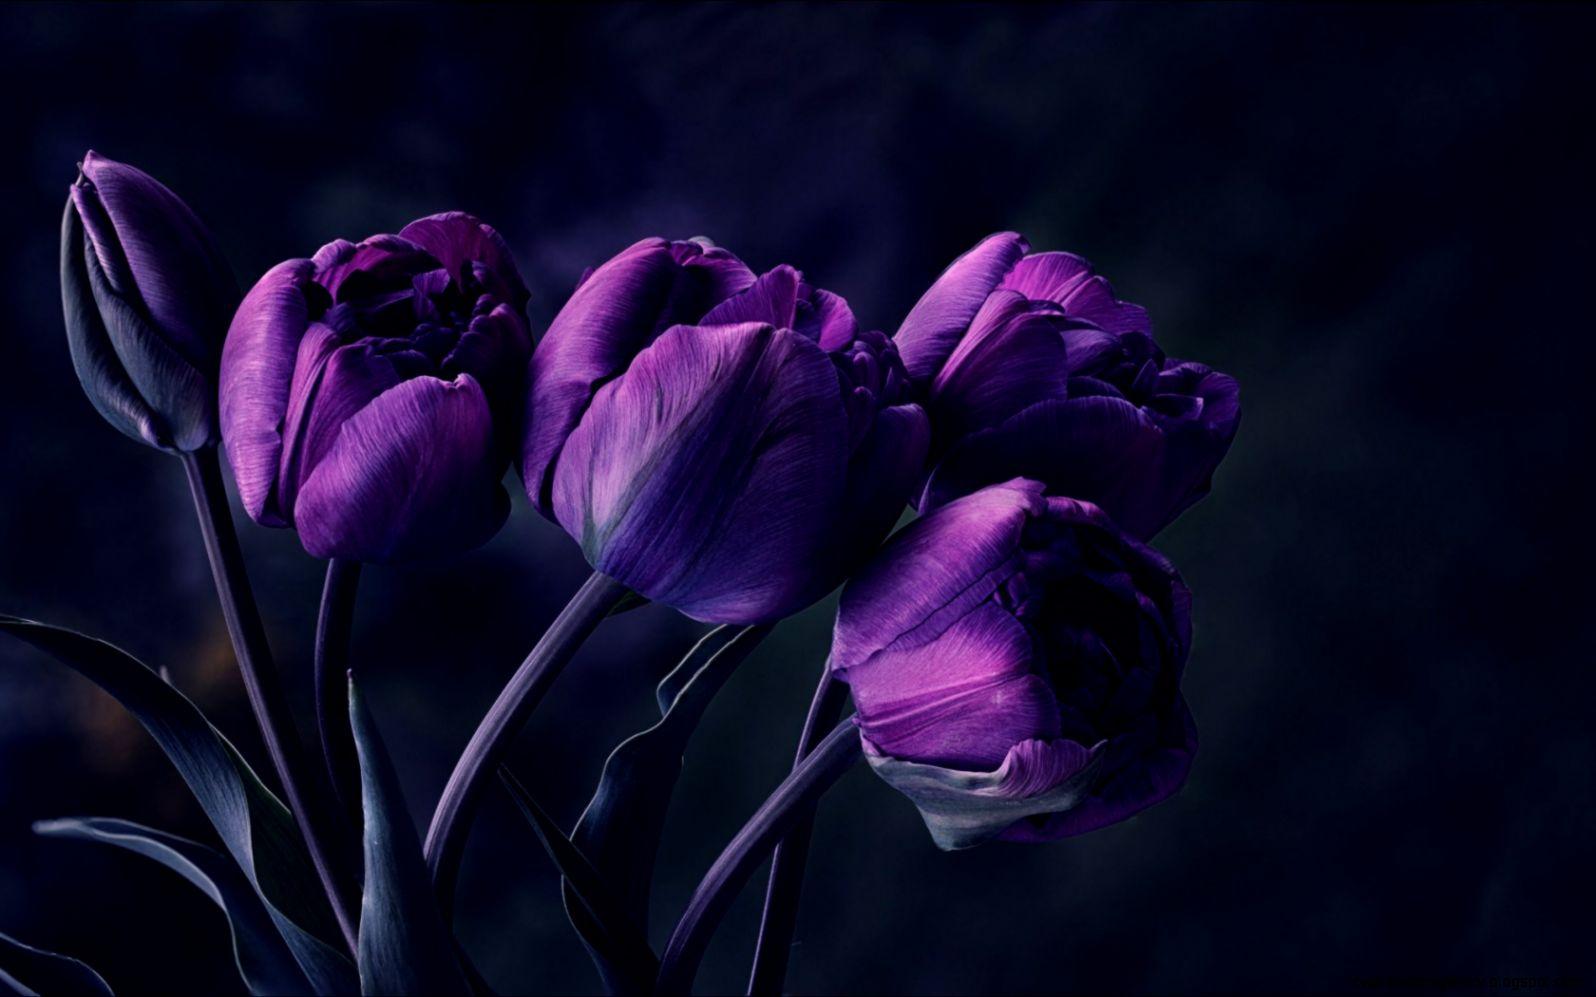 tulips yellow purple dew spring  ➳ S  P  R  I  N  G